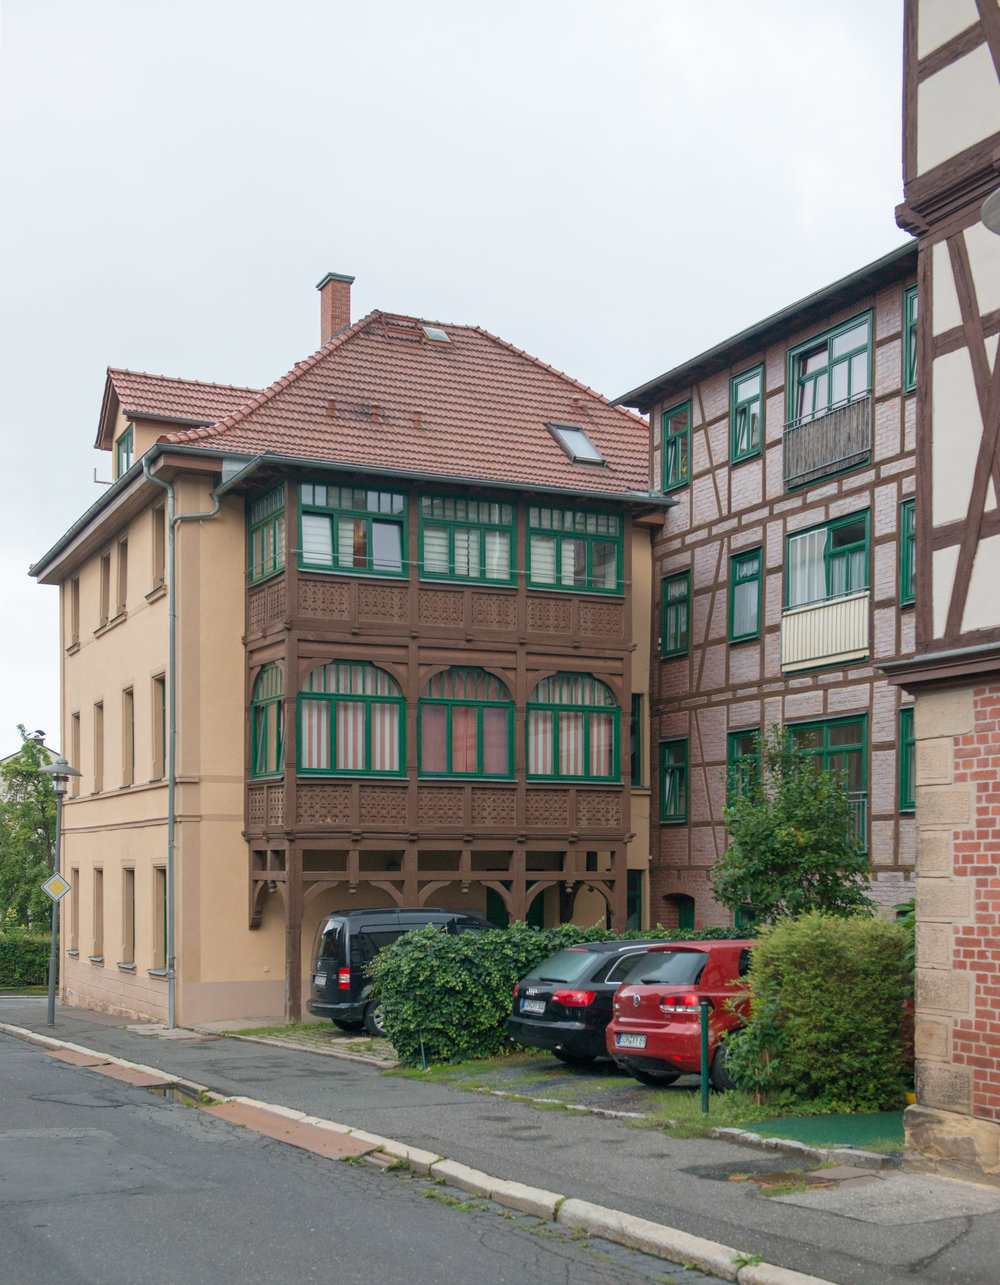 Bahnhofstr 4, Sonneberg (Rear view)